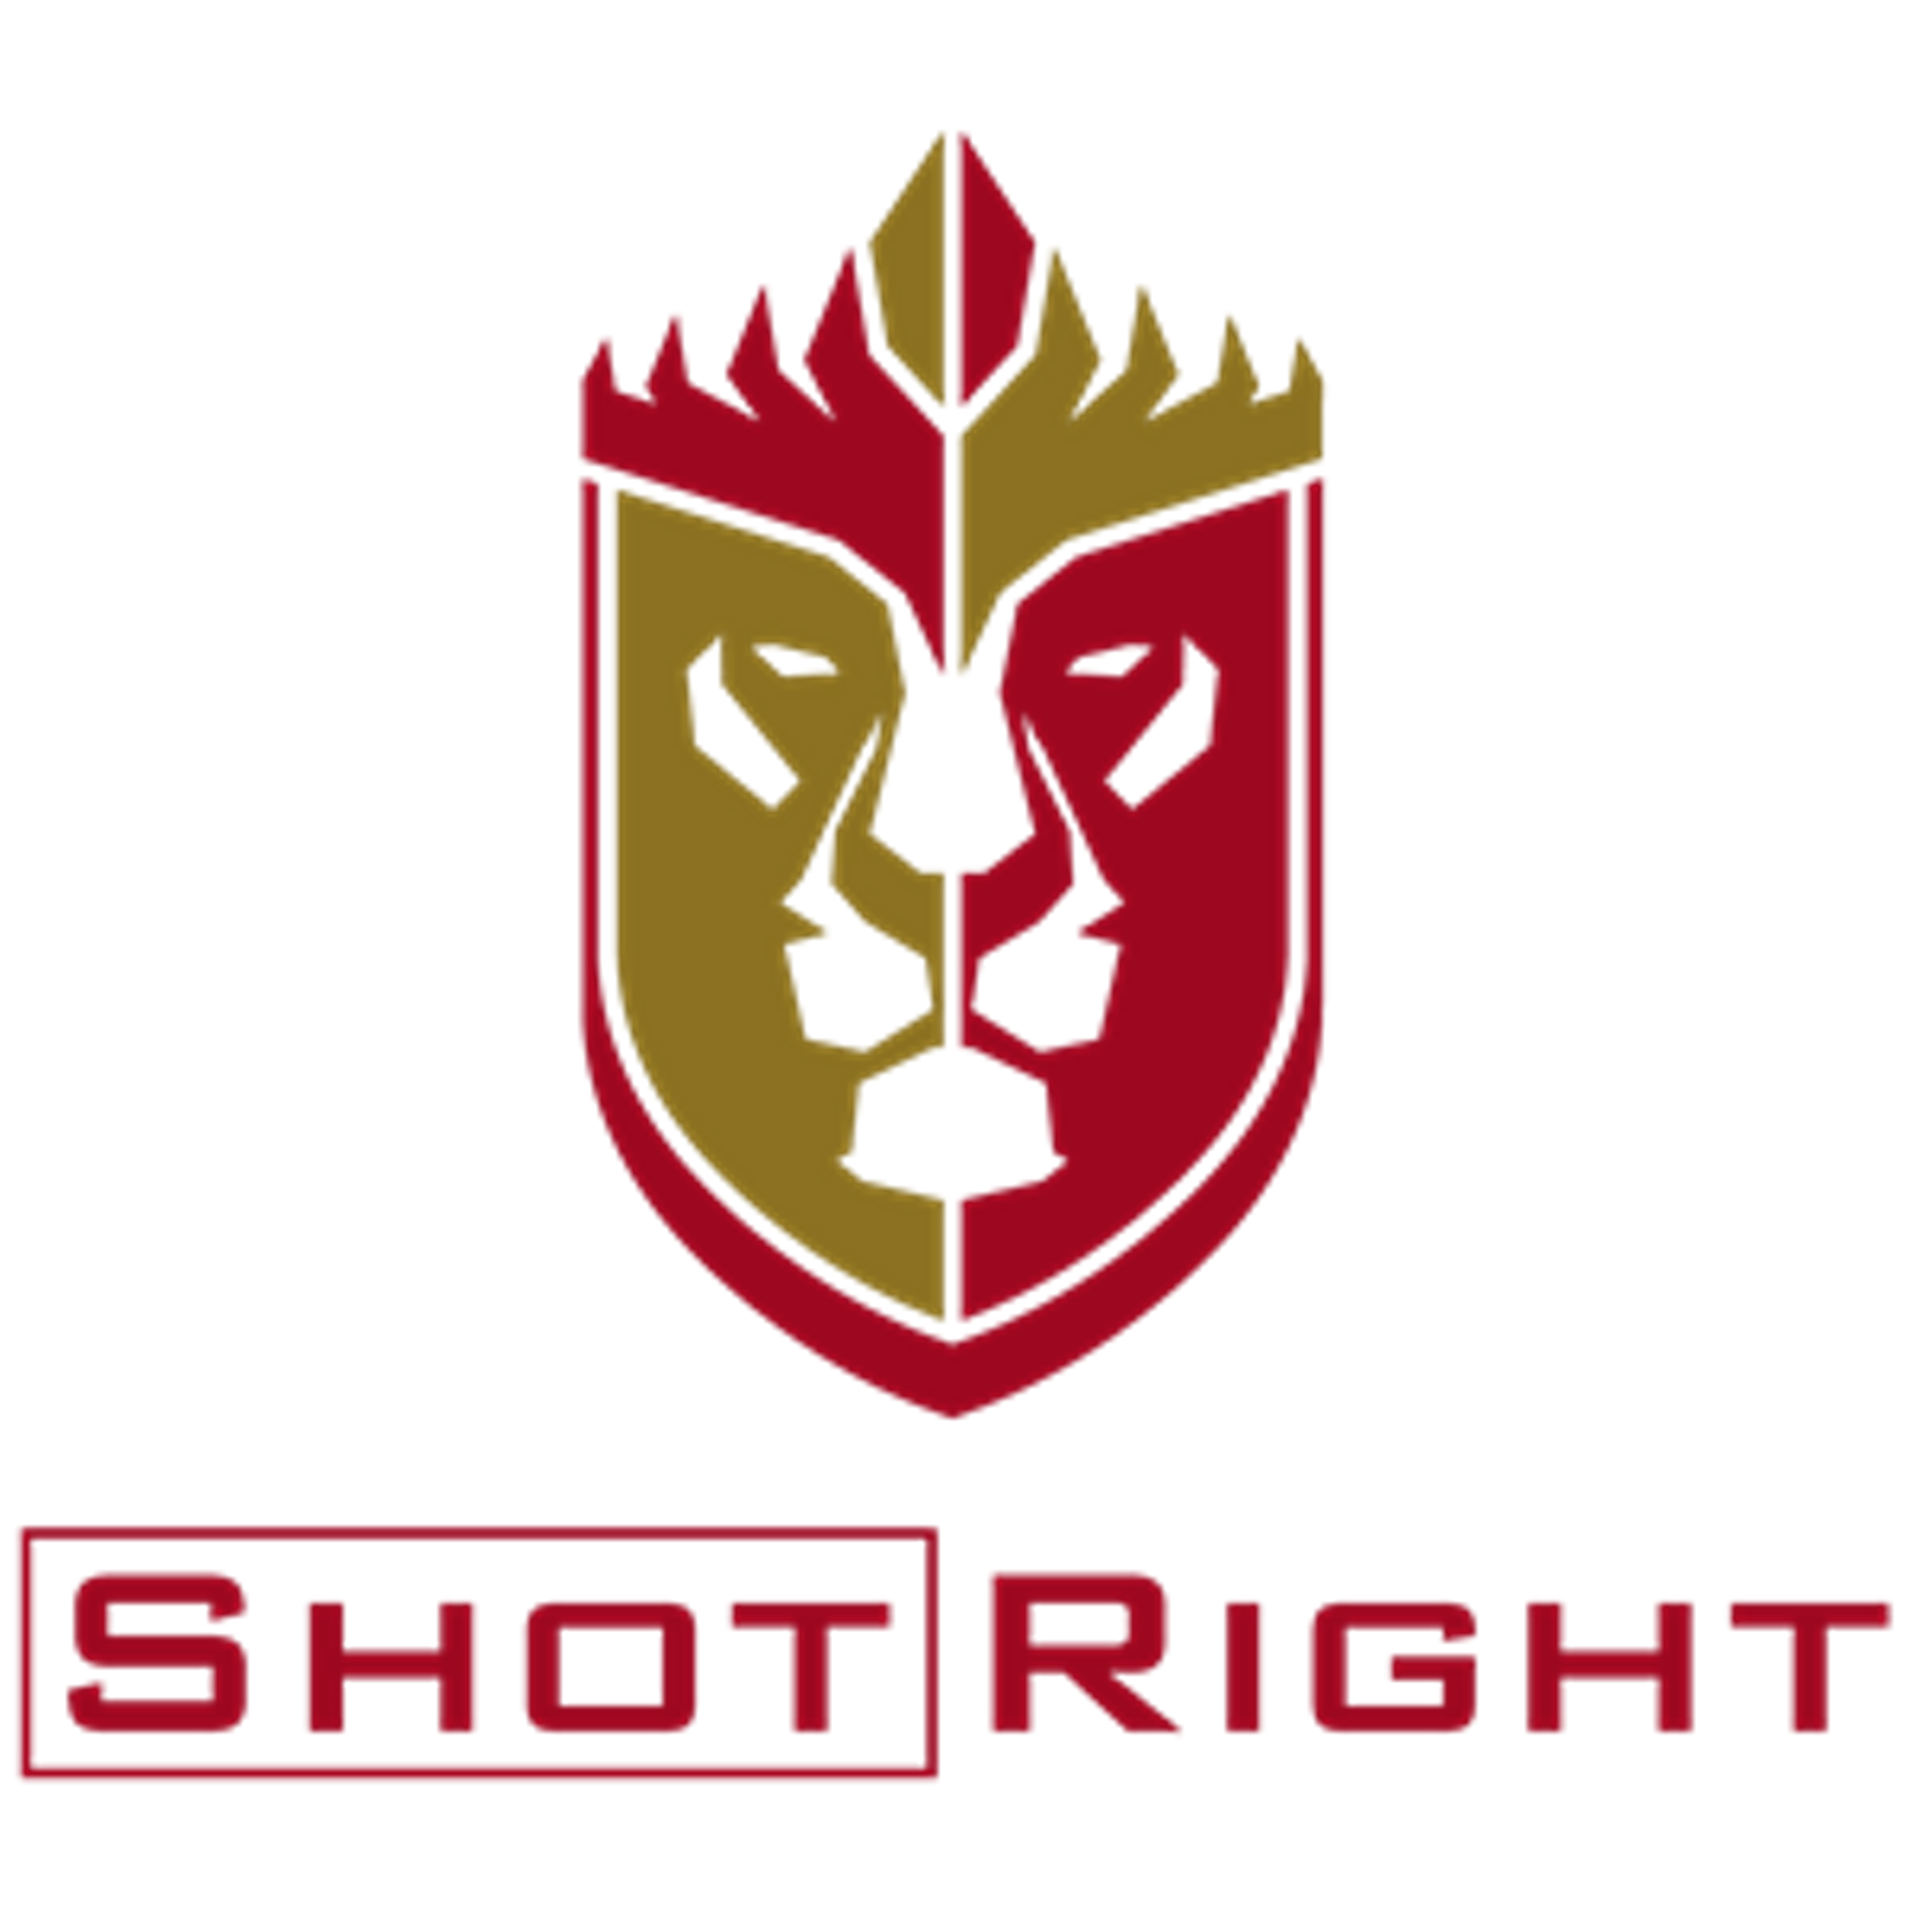 shot right training academy logo nra classes pinterest rh nz pinterest com nra logo download nera logistics